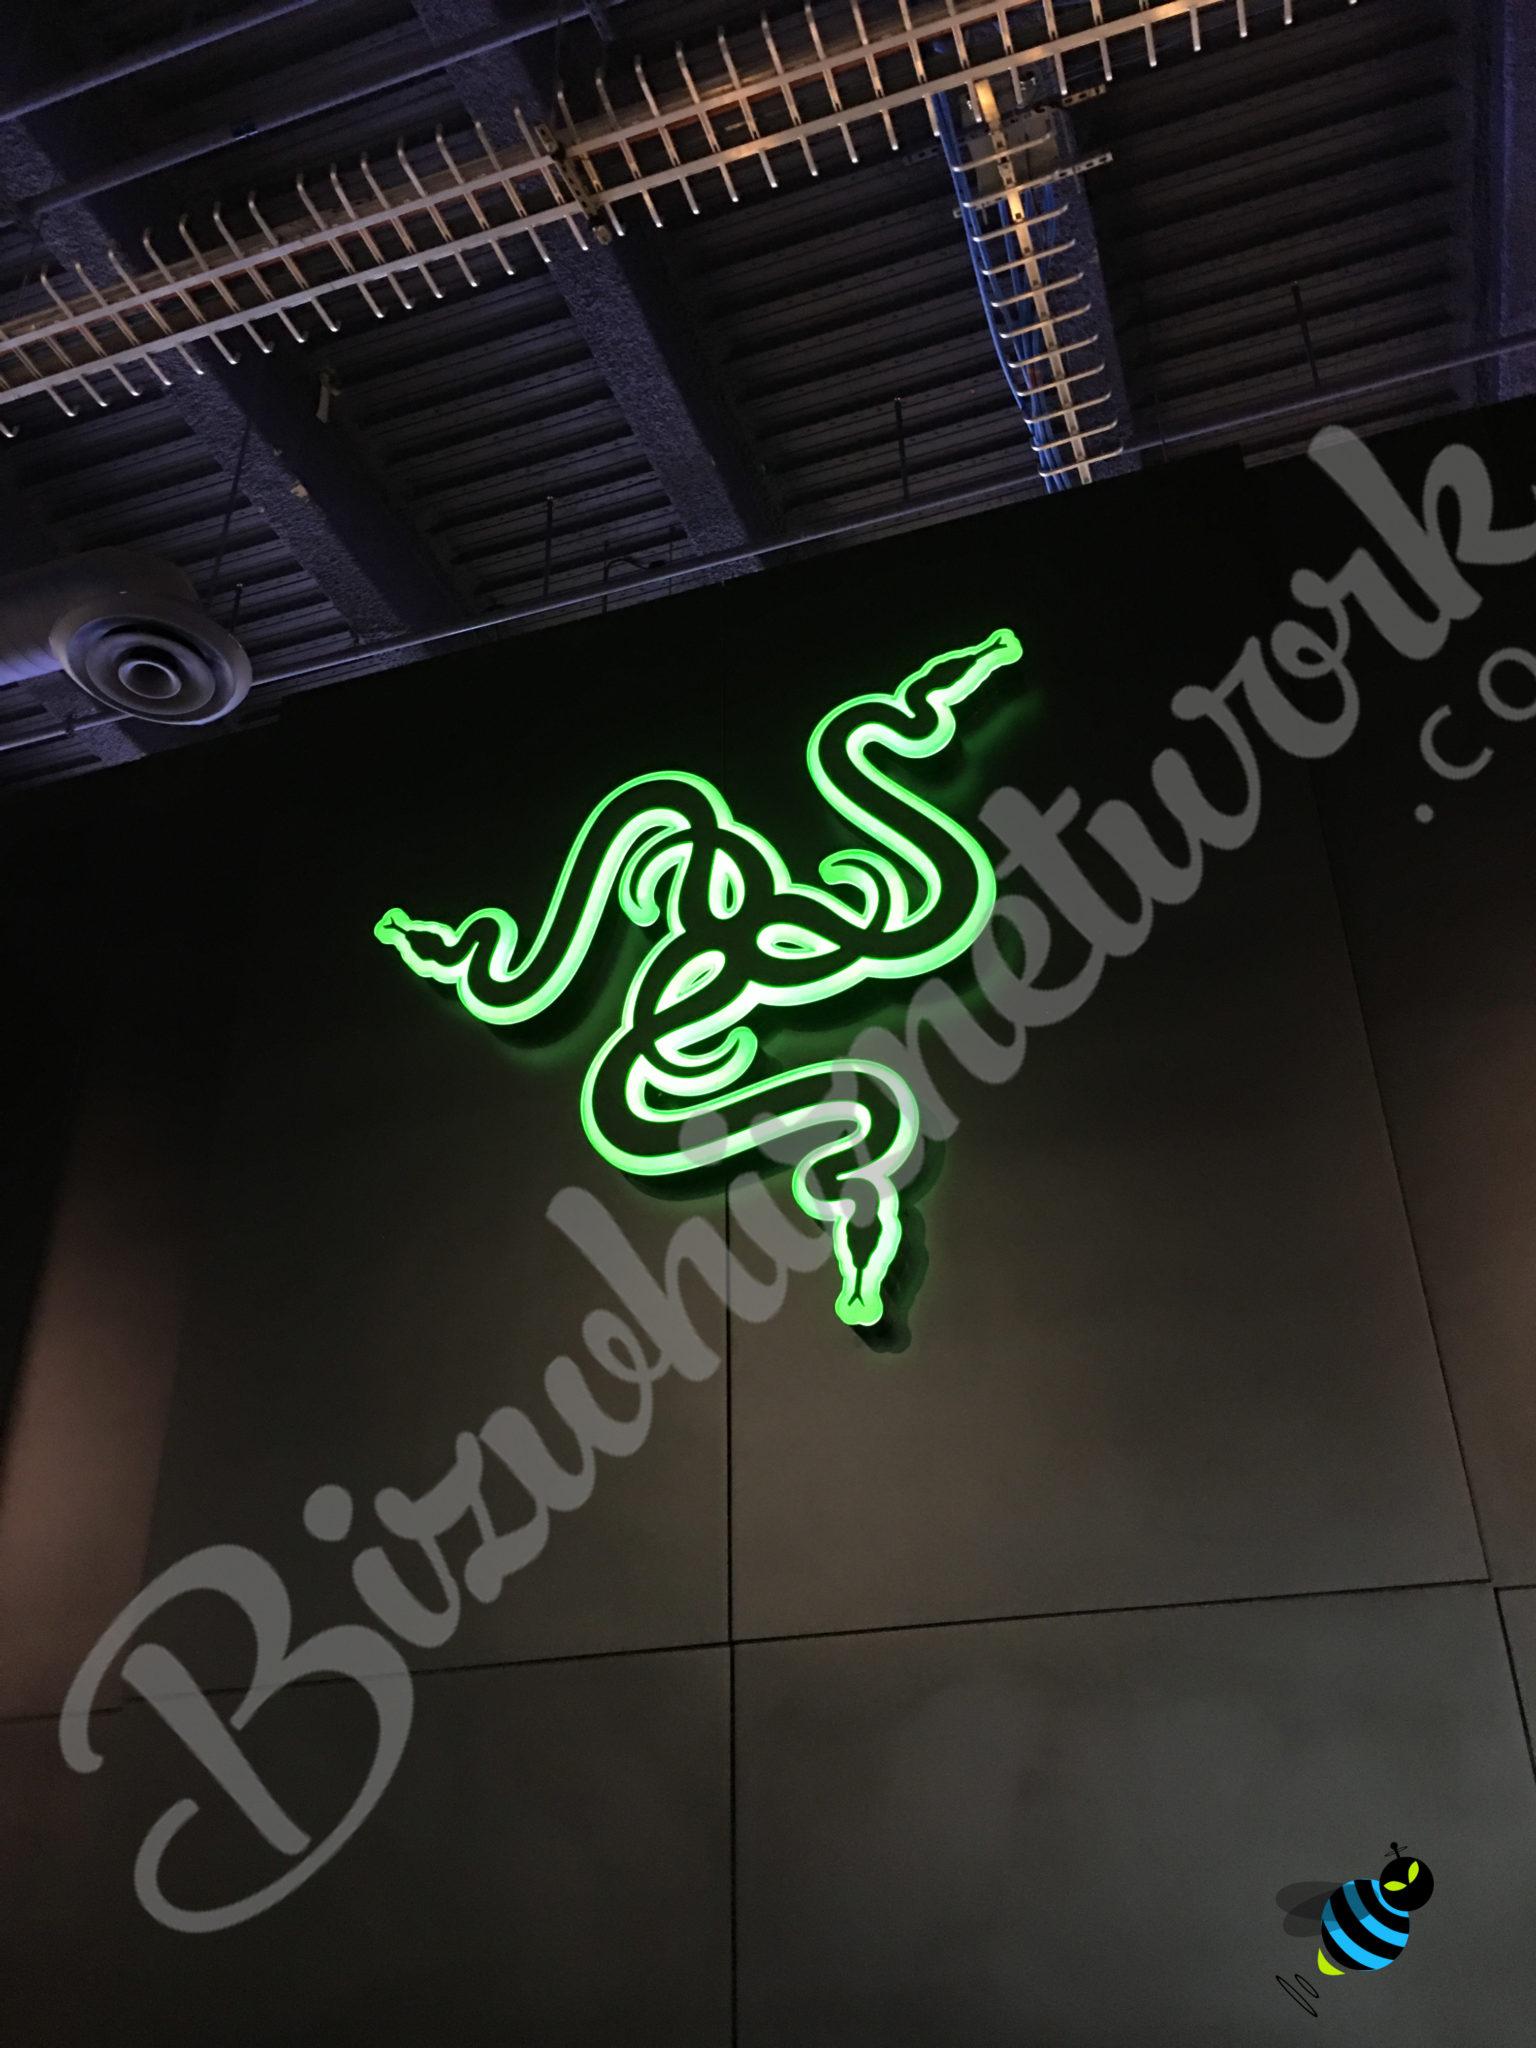 , Best Of CES 2020 Las Vegas Bizwhiznetwork.com Limited Edition, #Bizwhiznetwork.com Innovation ΛI